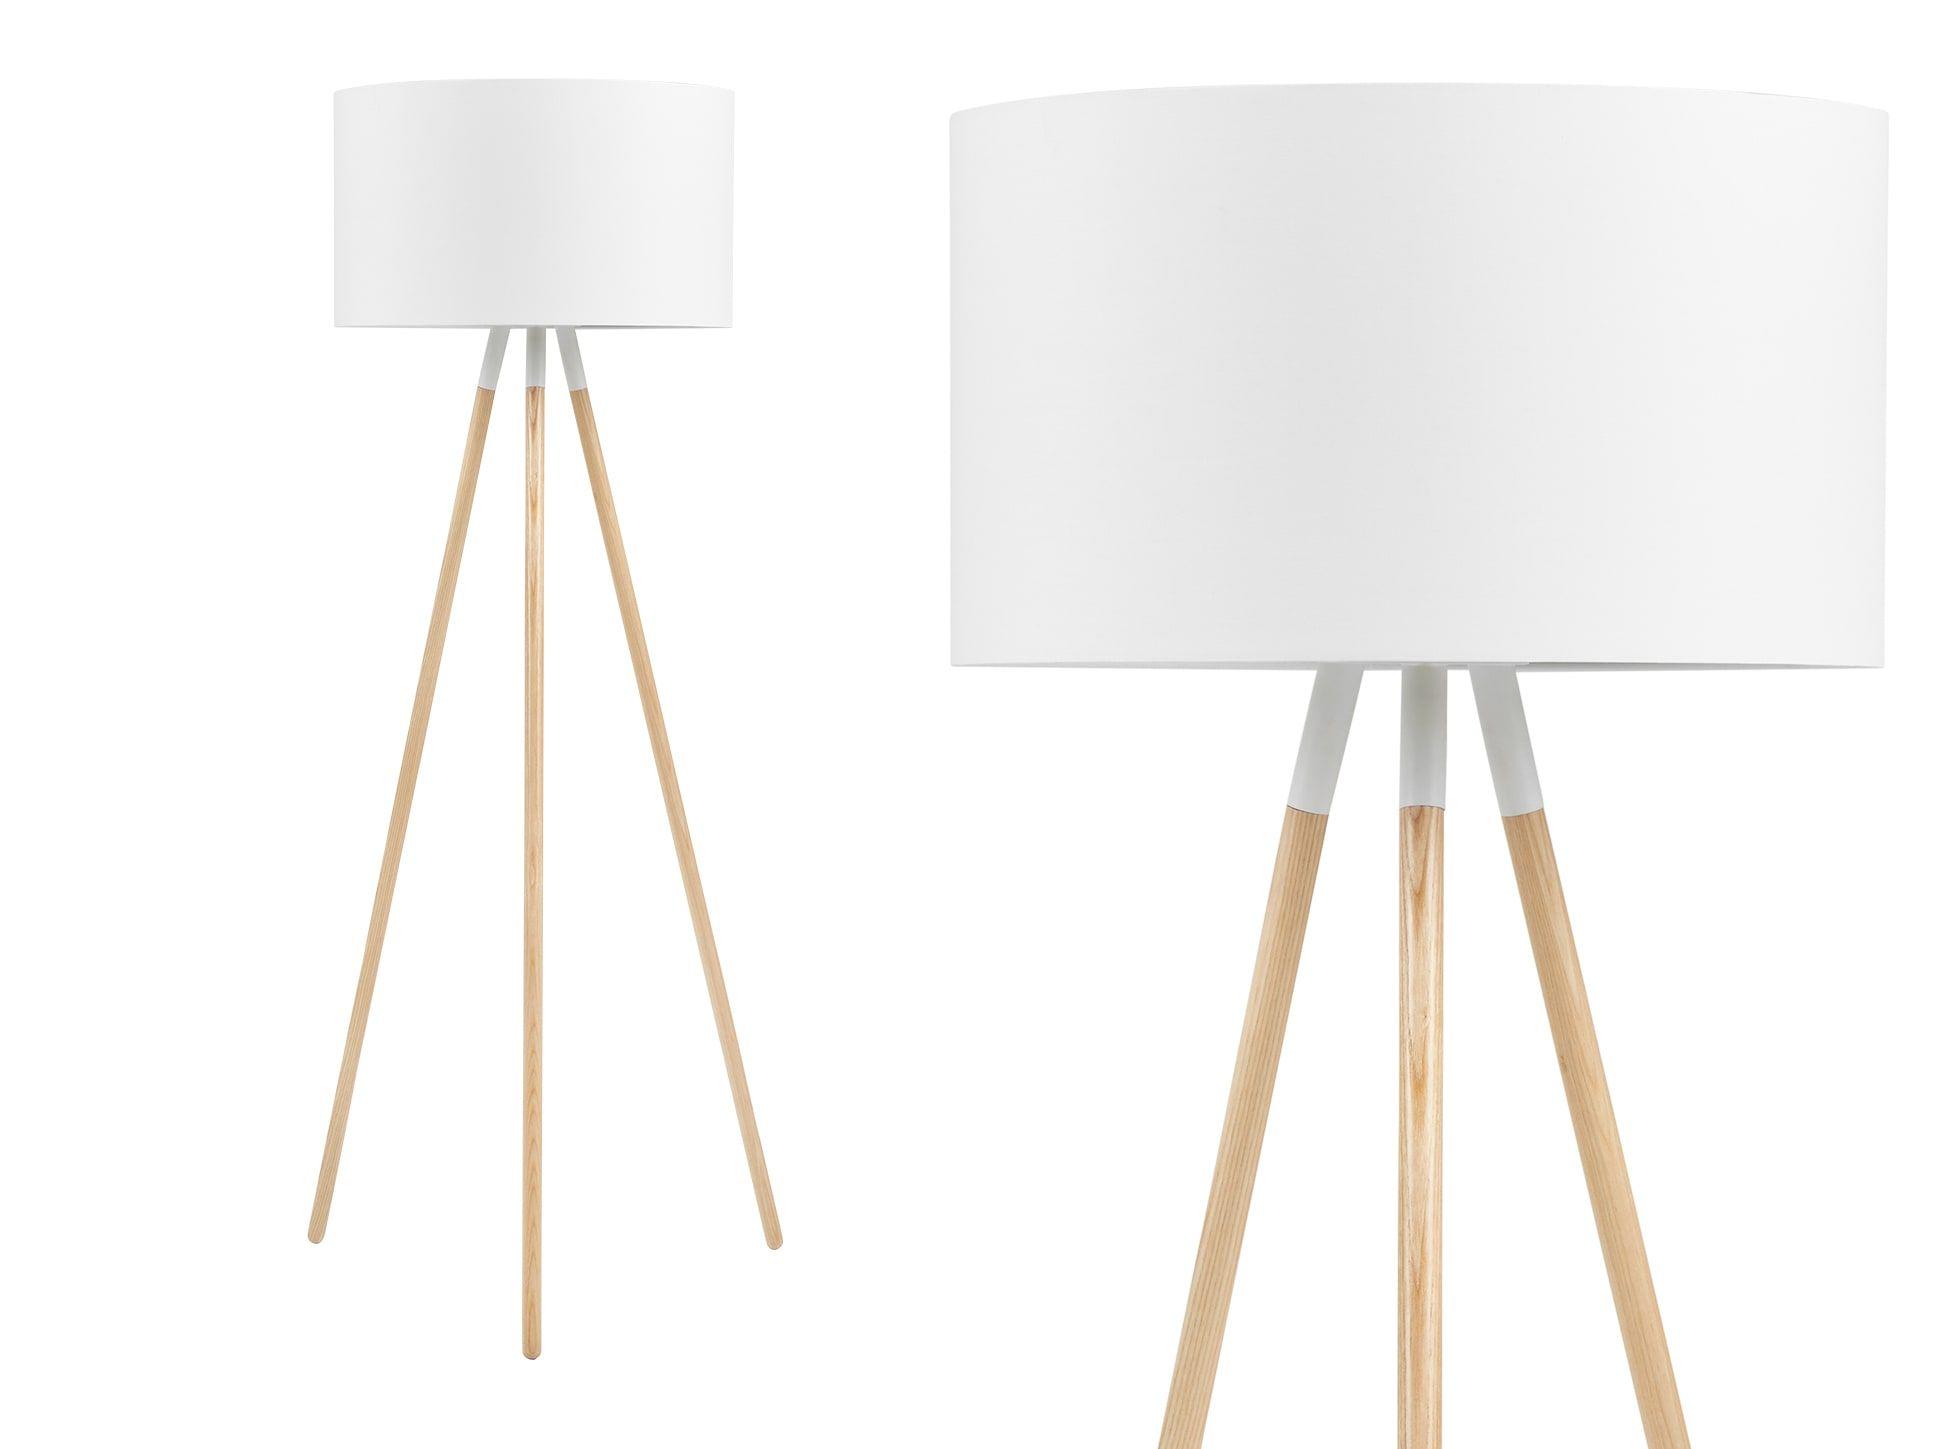 eric tripod stehlampe wei lampe wz pinterest. Black Bedroom Furniture Sets. Home Design Ideas